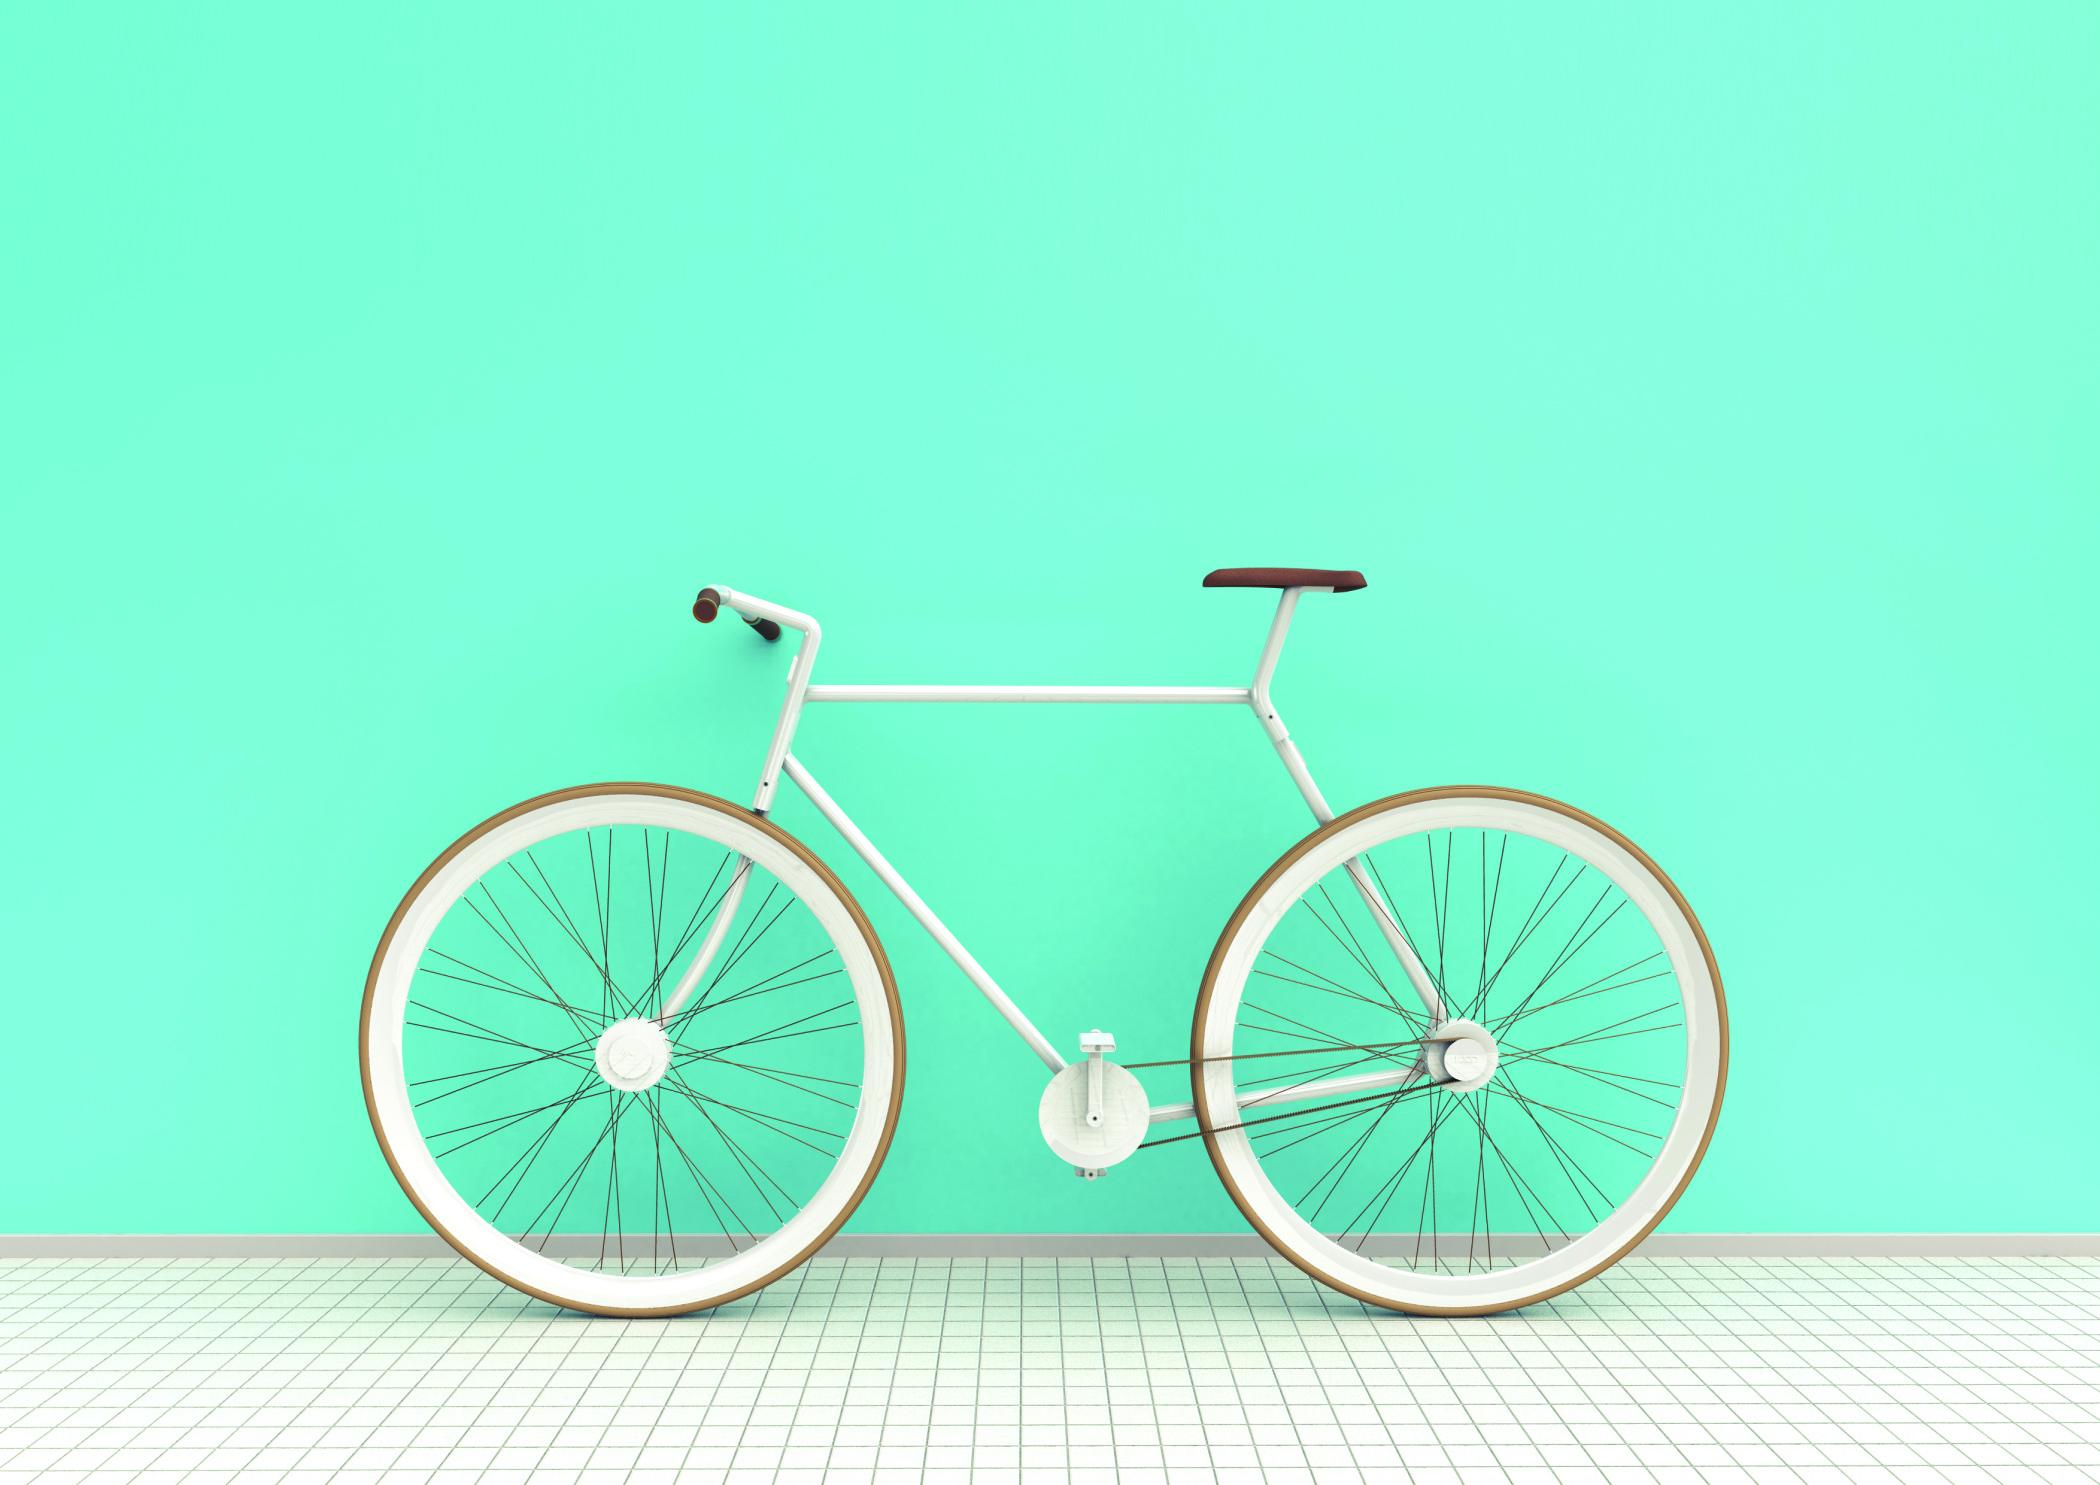 kit-bike_design_001